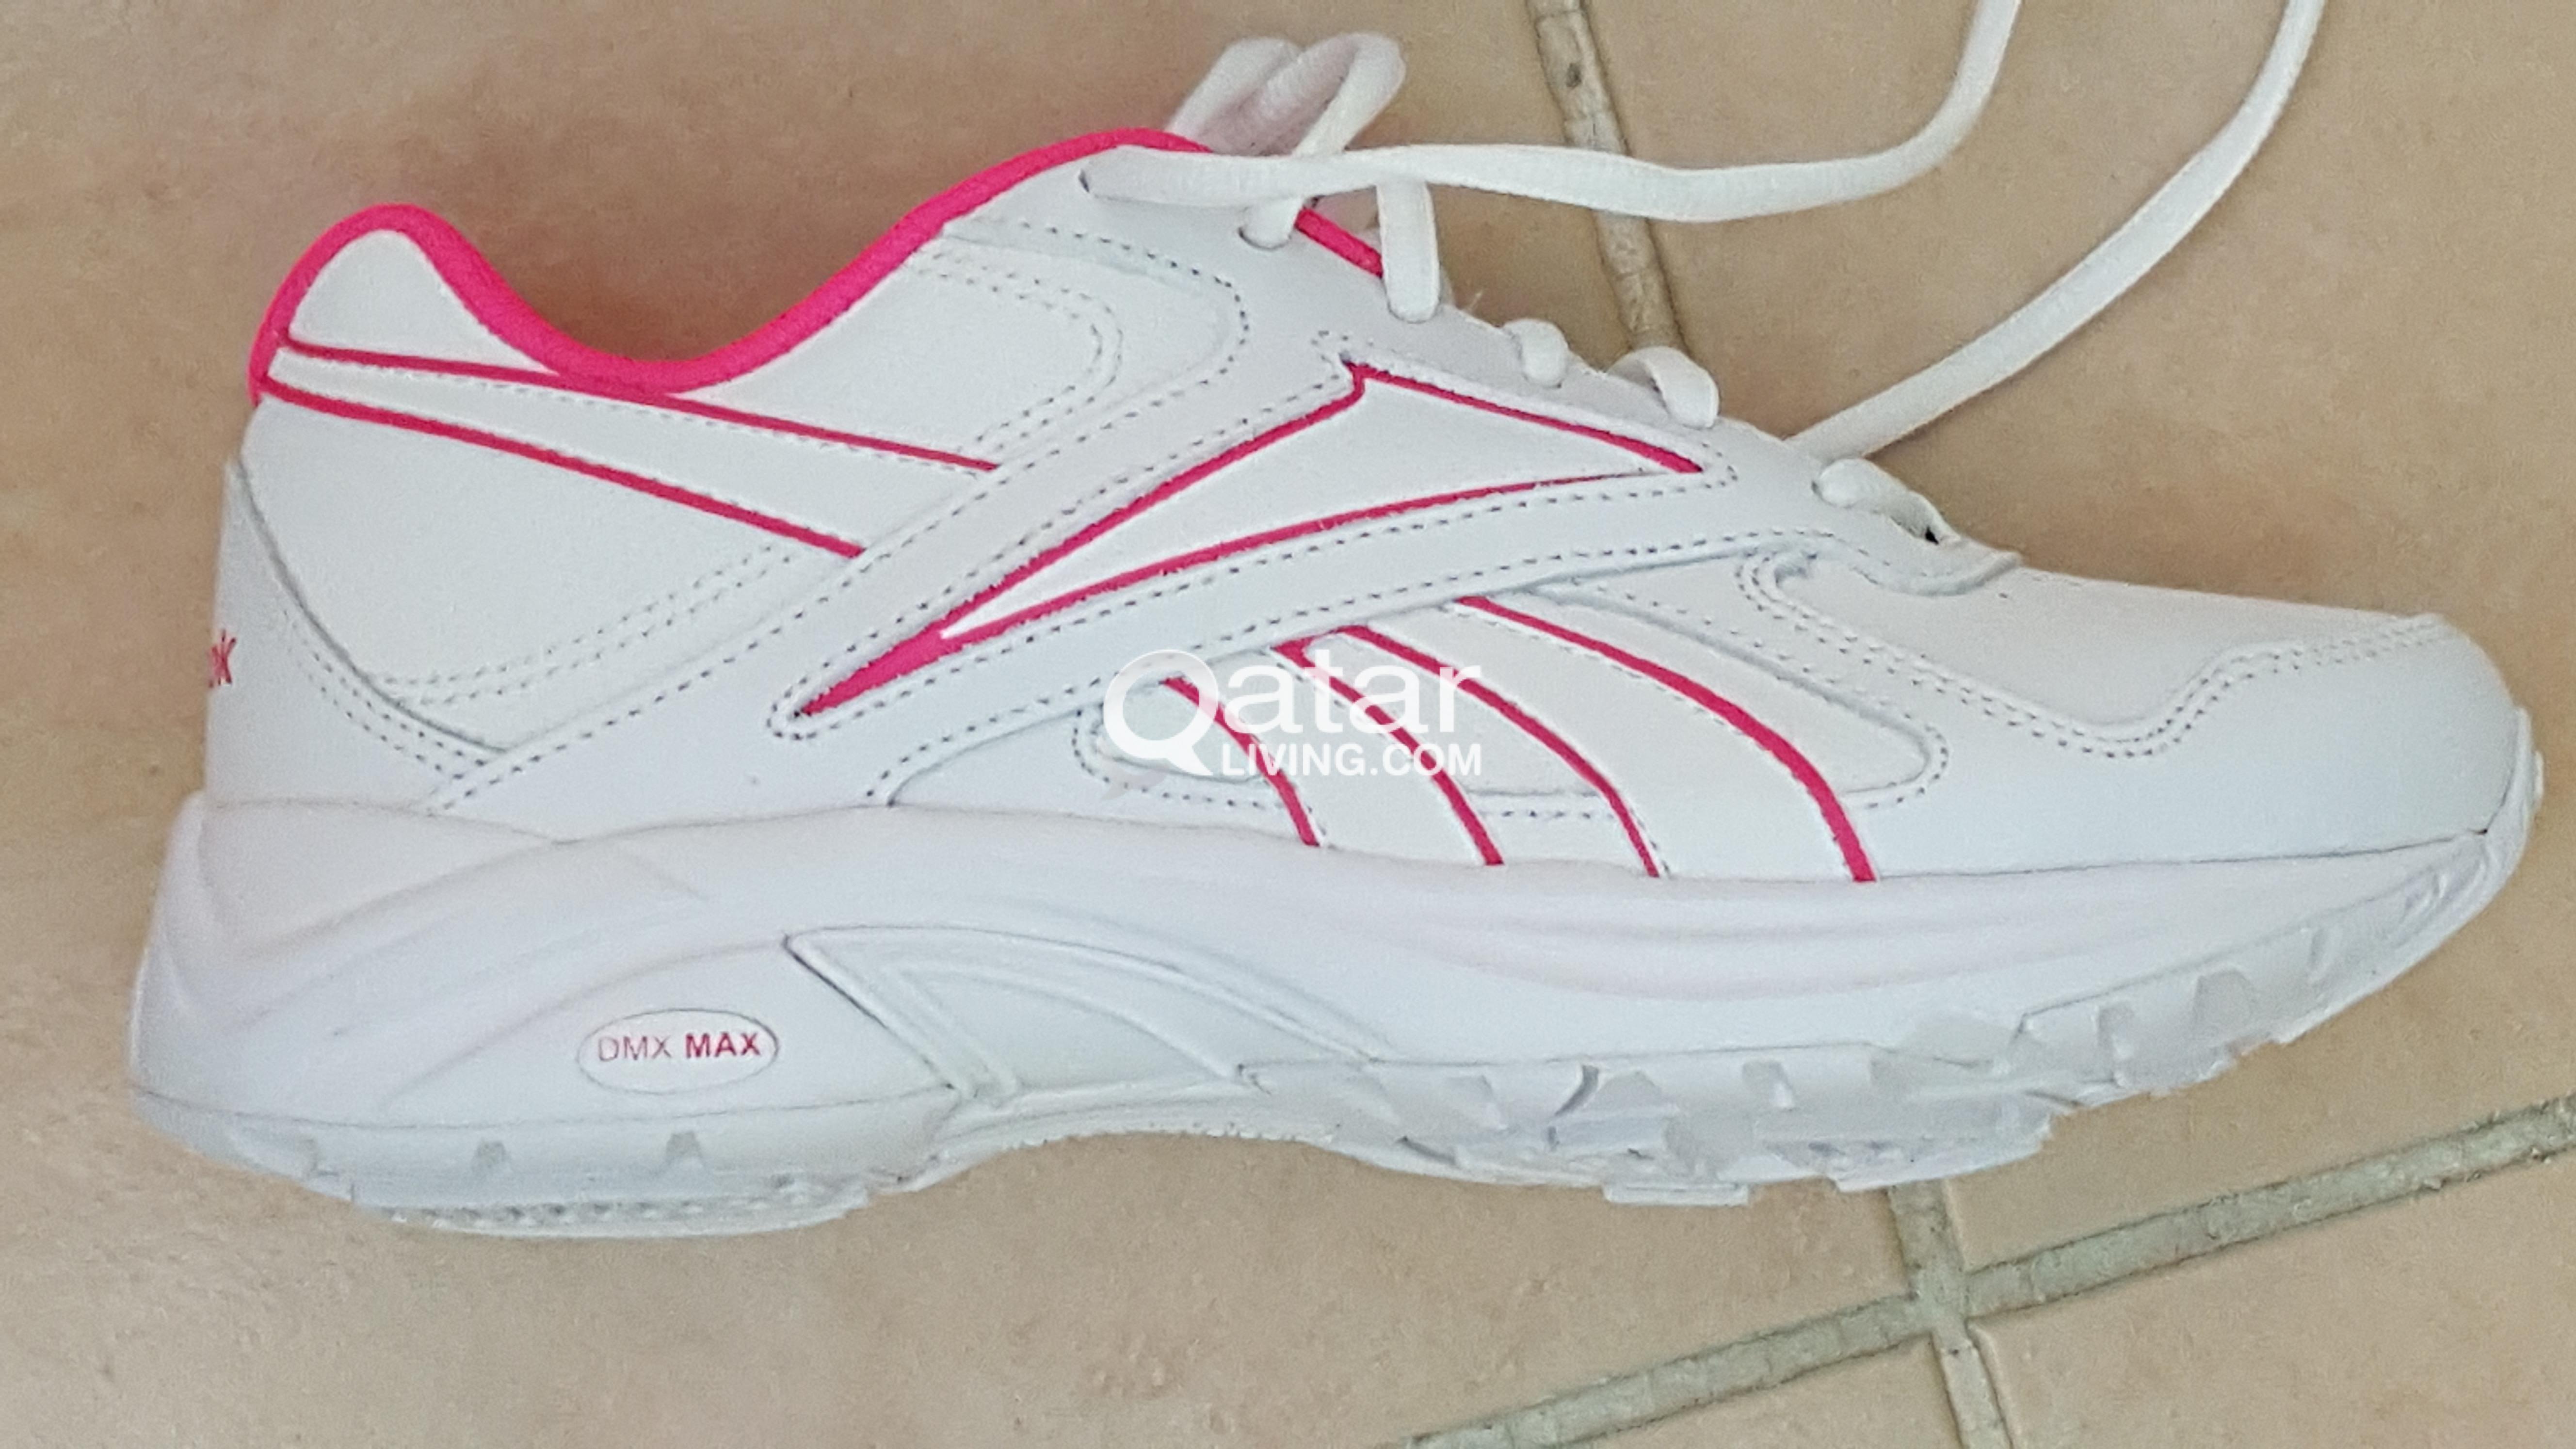 7594503461e Brand New Reebok Womens Ultra V Dmx Max White Walking Shoes Size 5.5 U.S. 36  EUR